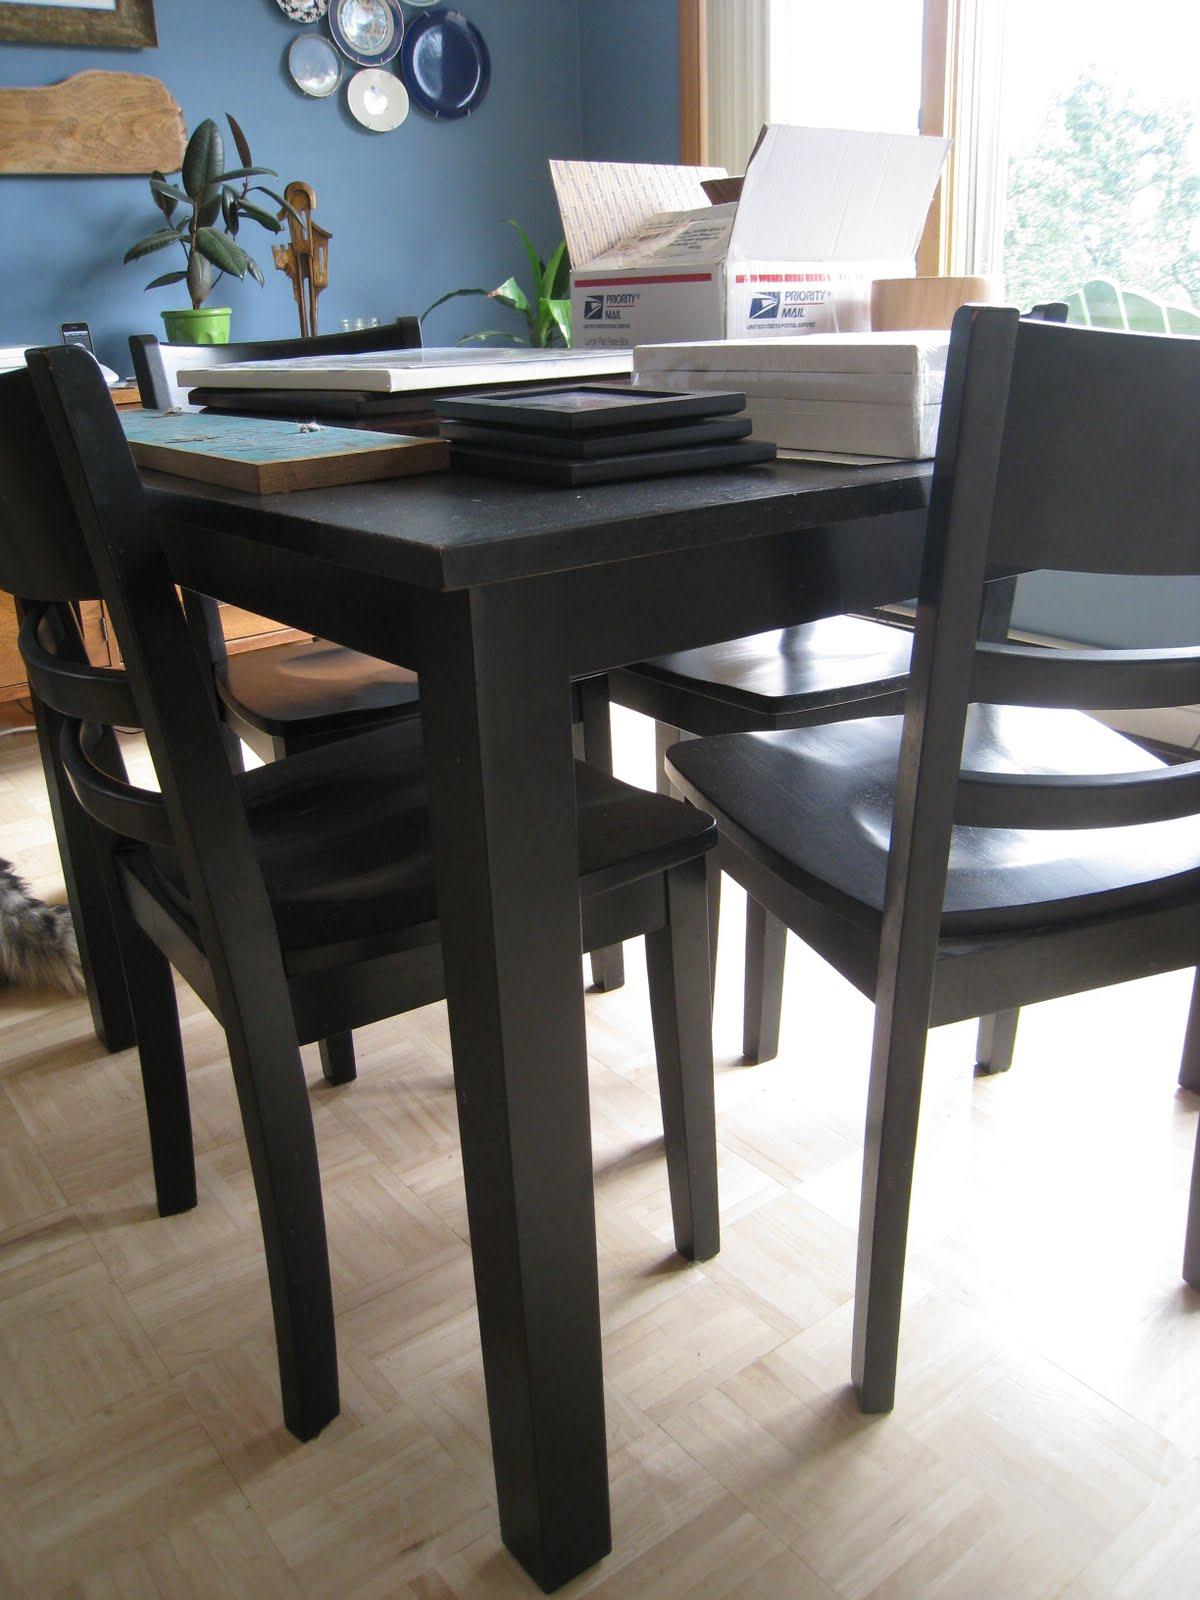 8 Charming Fred meyer dining table  Estateregionalcom